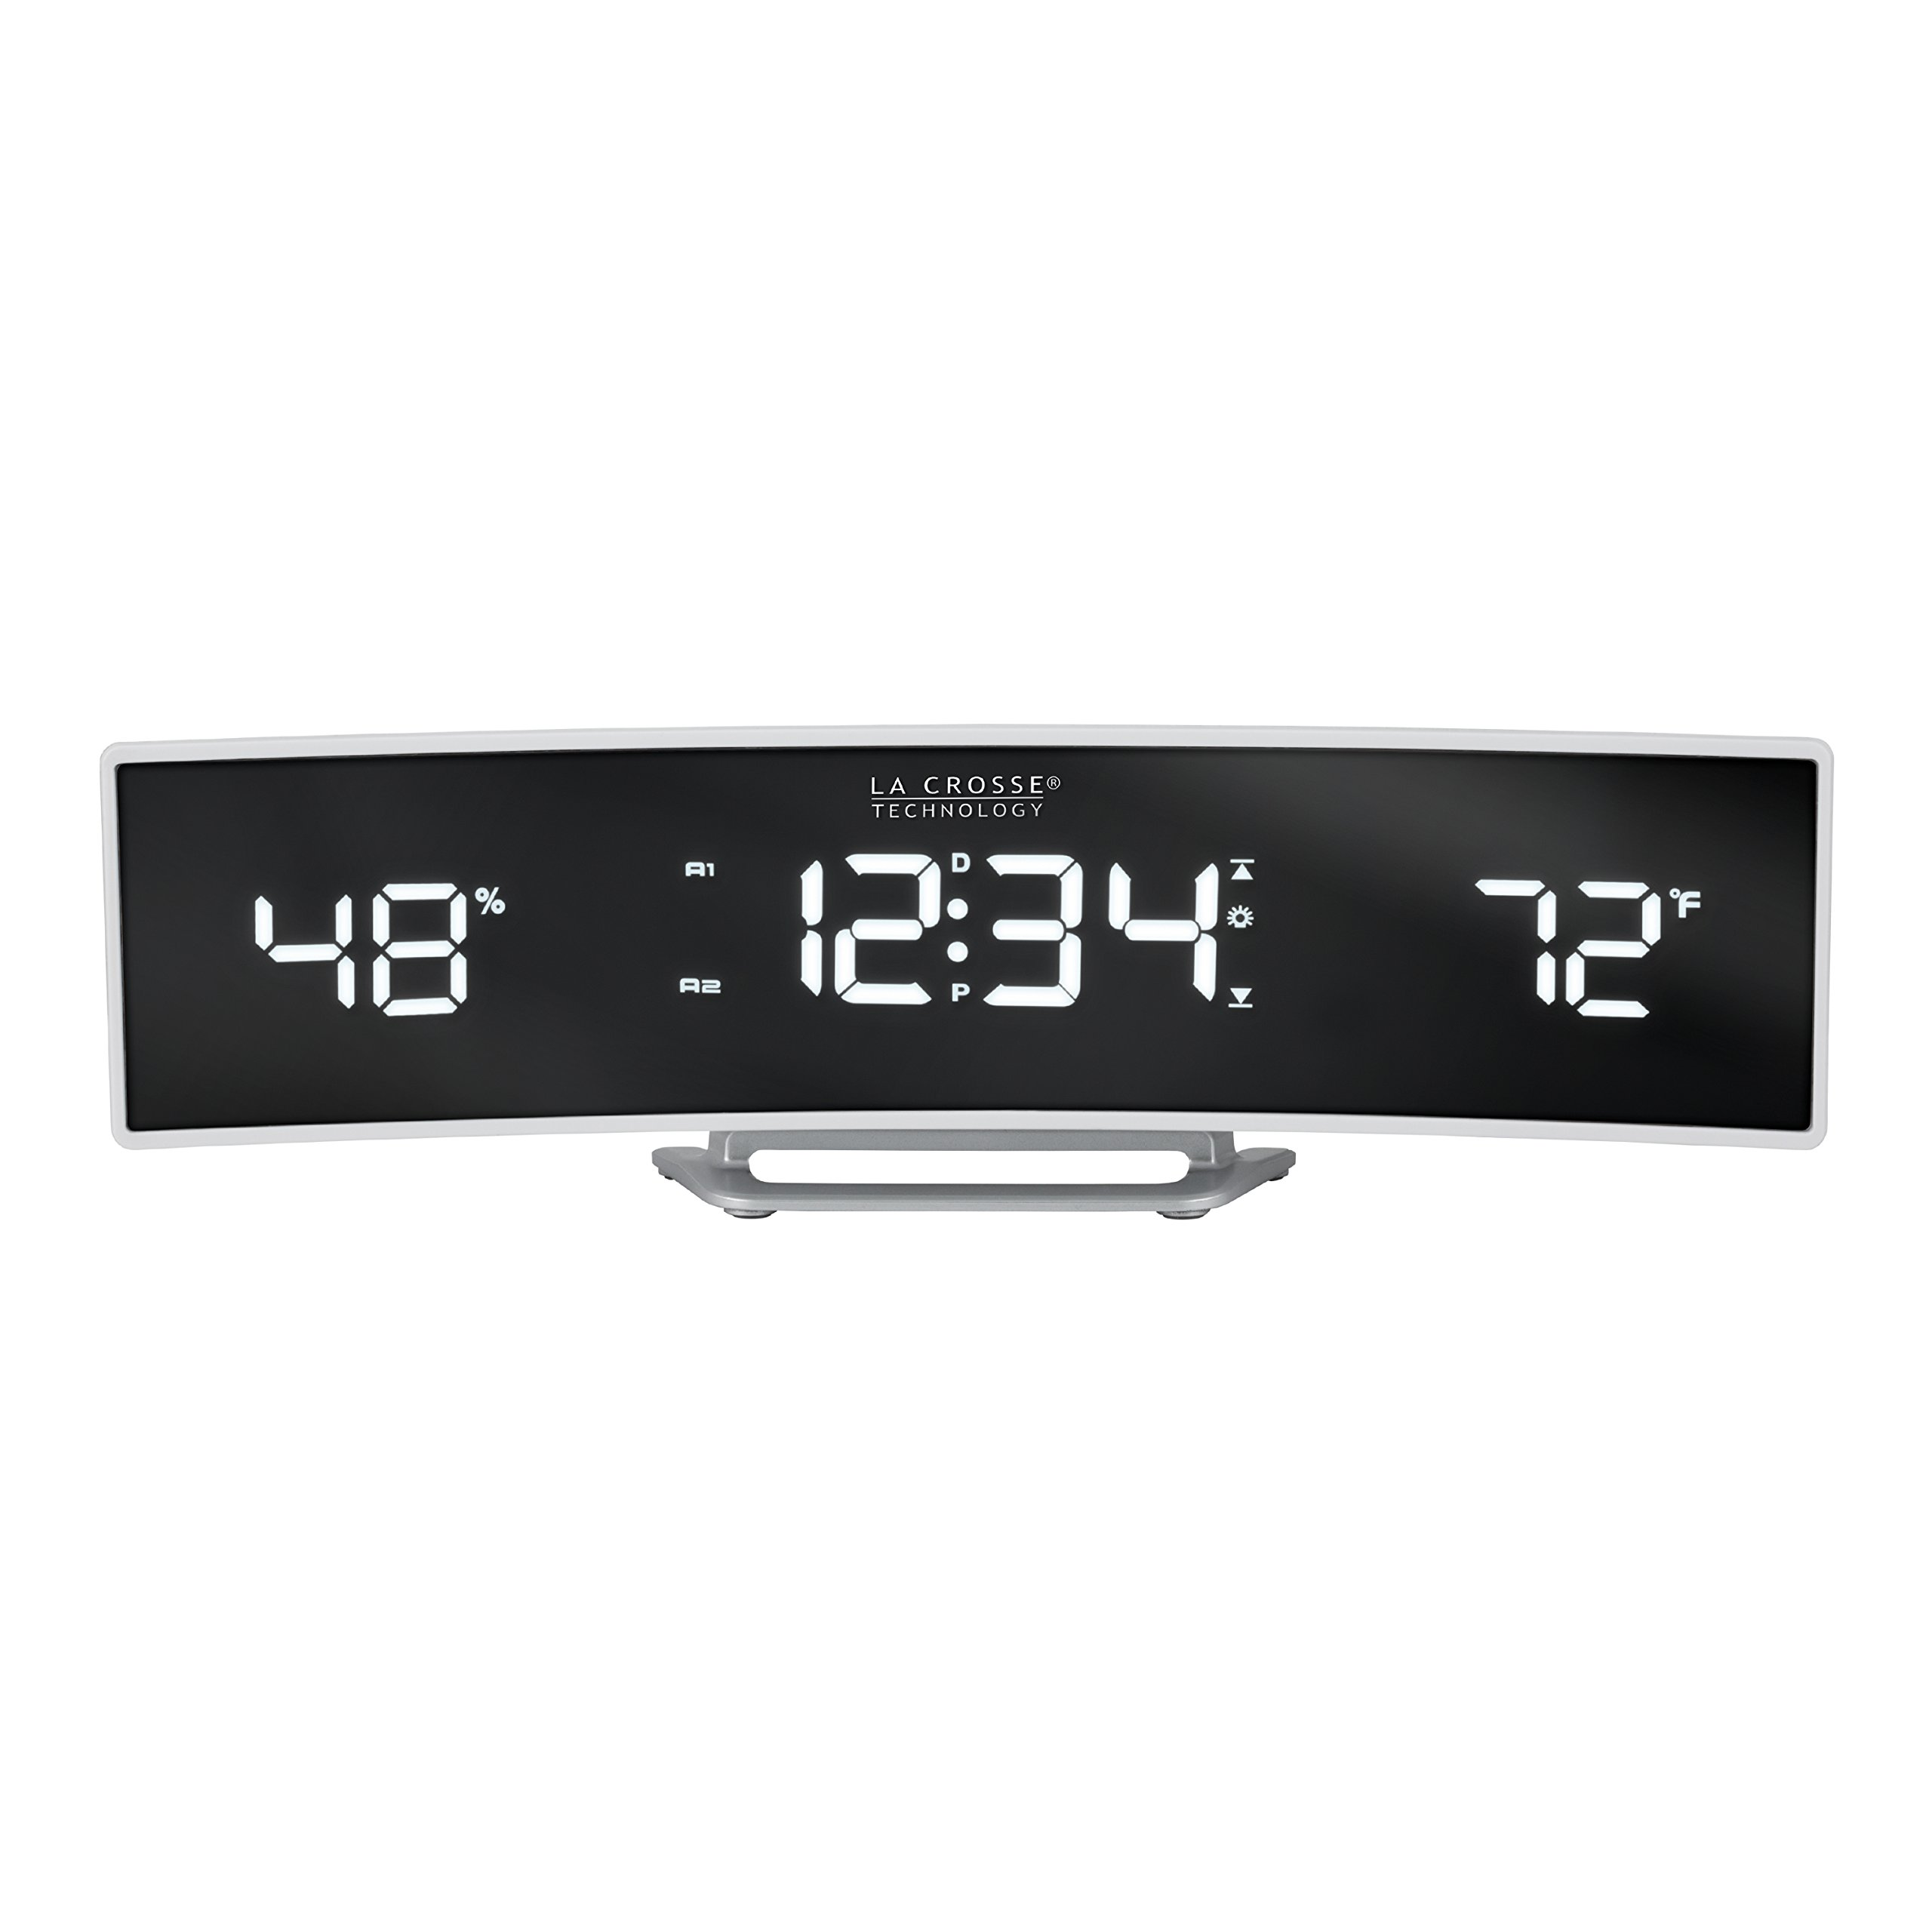 La Crosse Technology 602-247 Alarm Clock, White